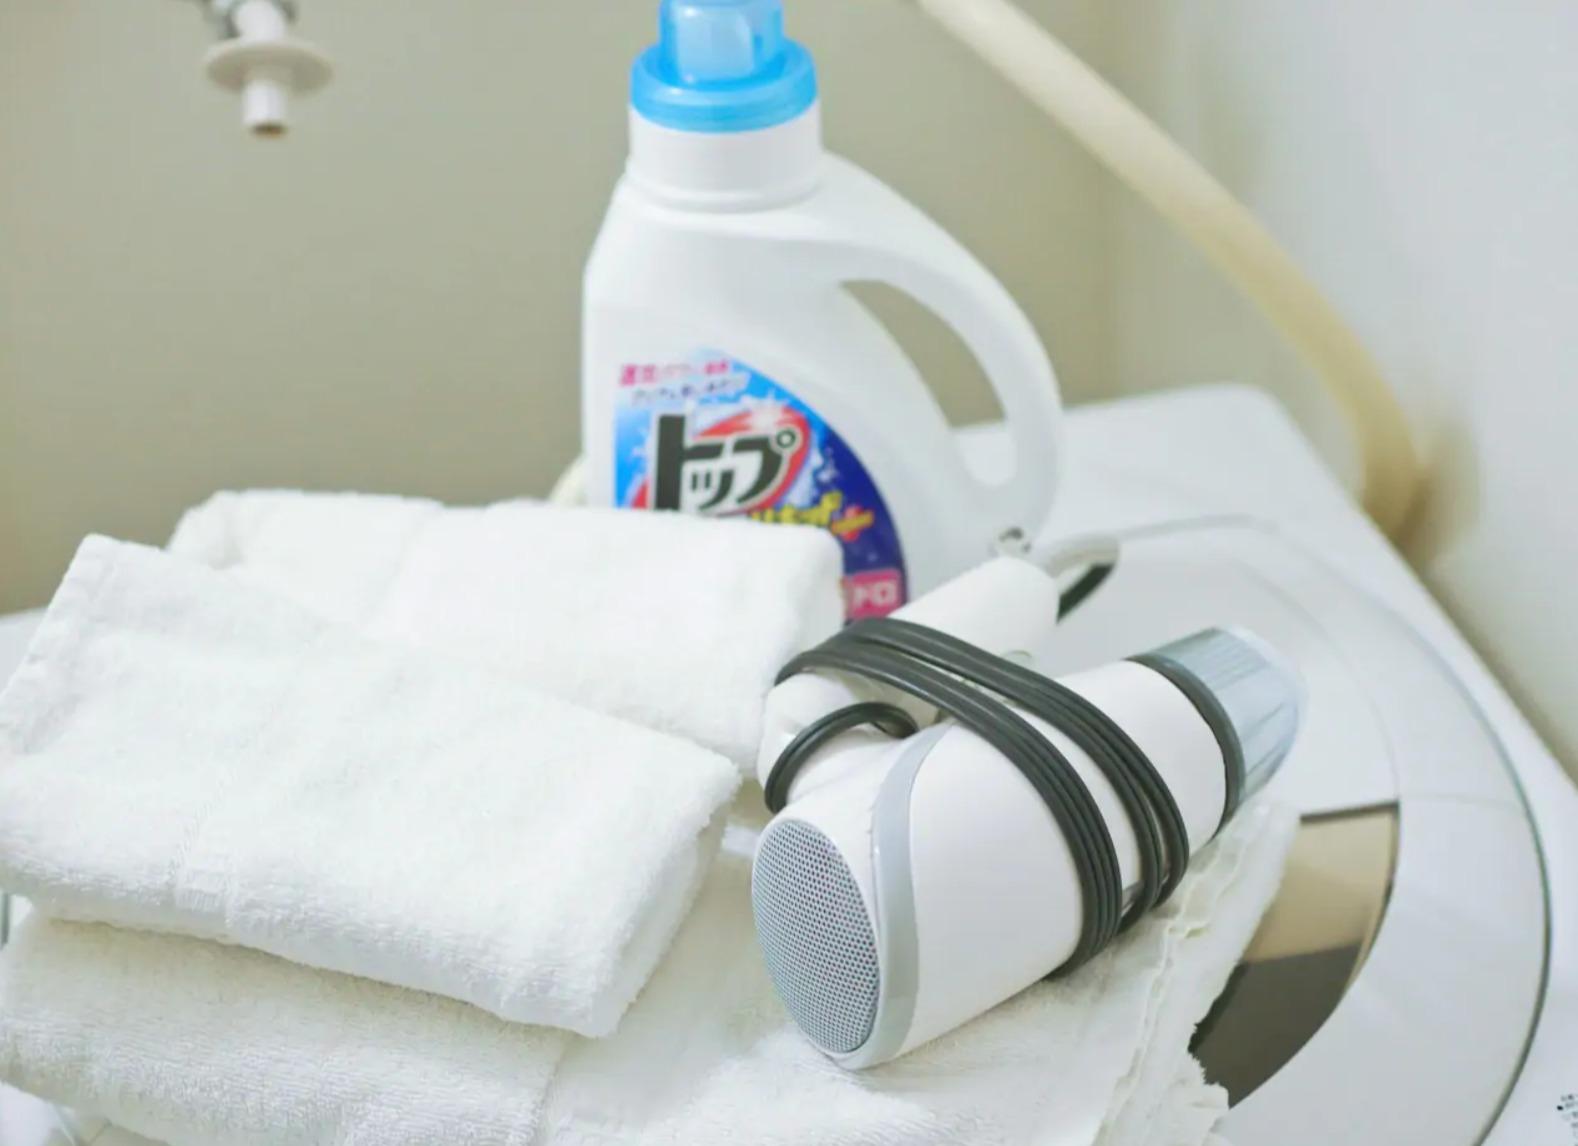 Detergent is prepared. 洗剤の準備もしています!